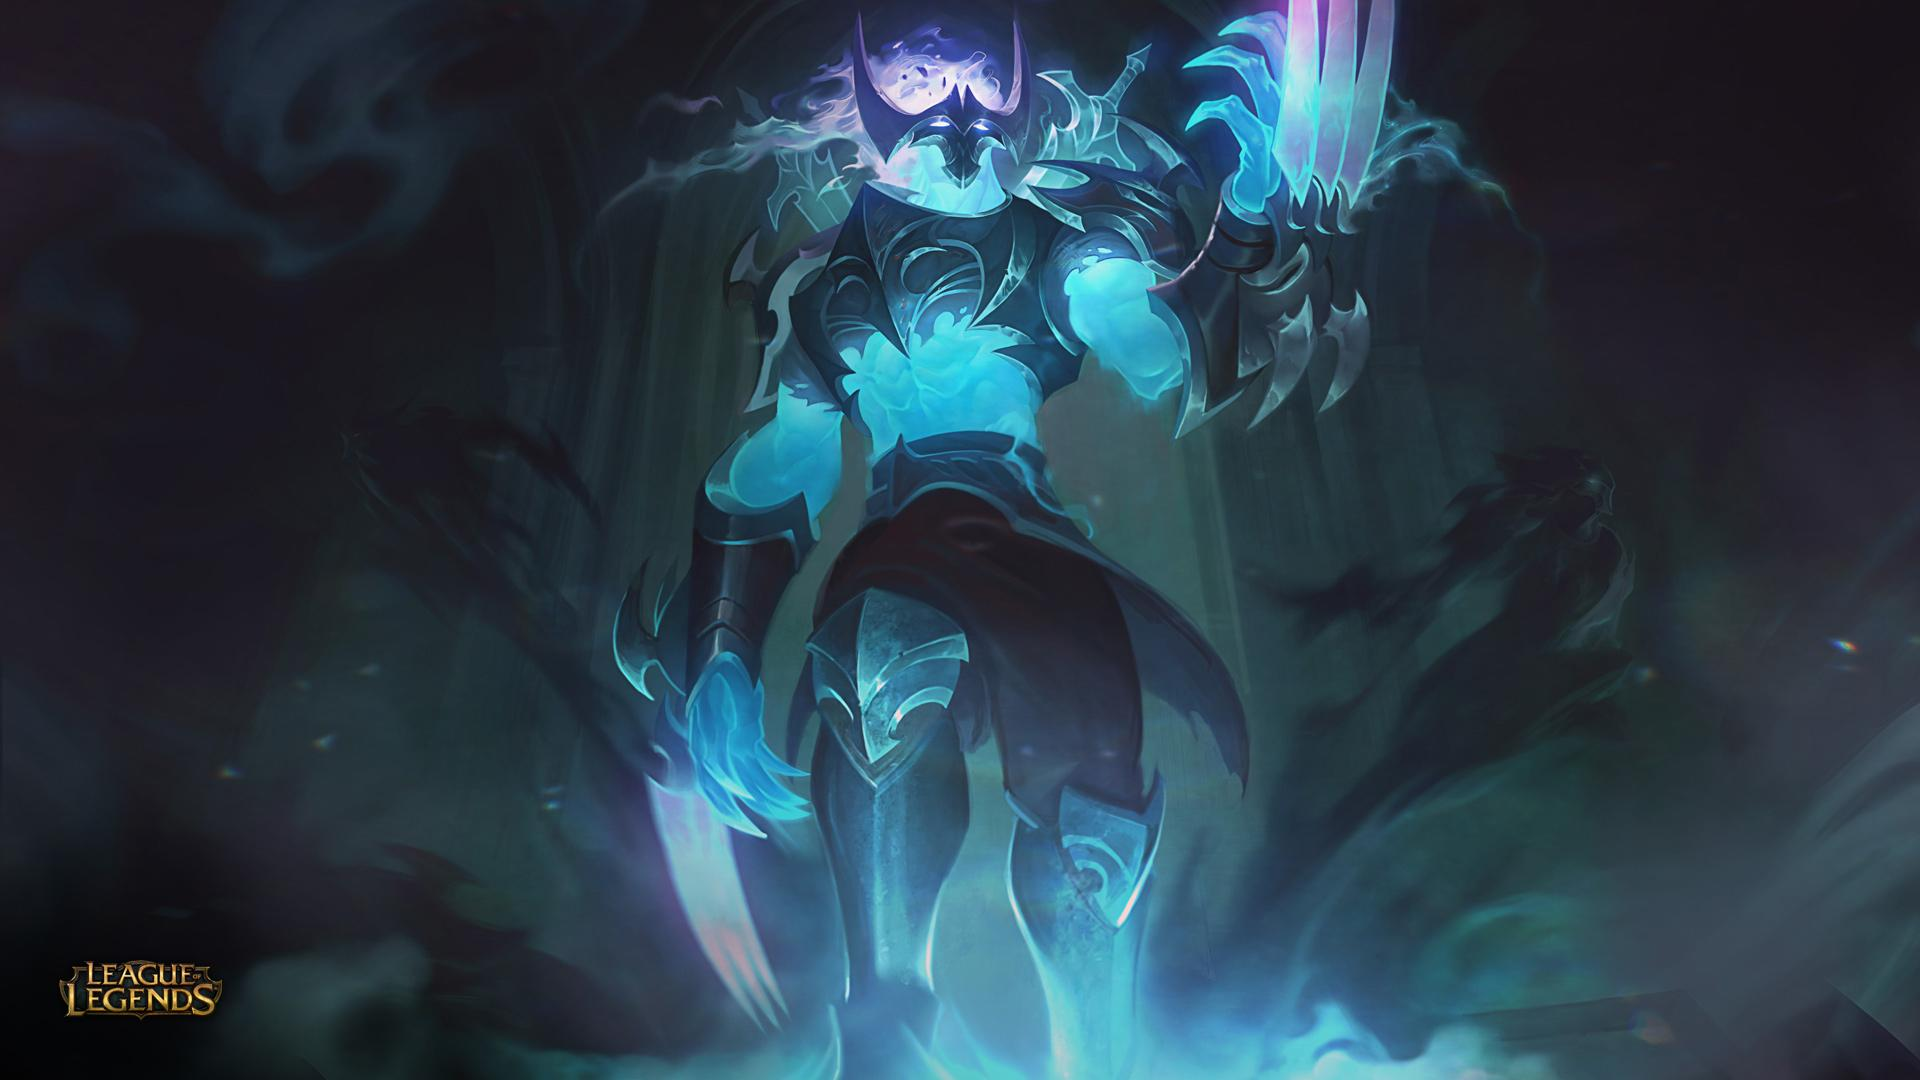 Wallpaper Zed, league of legends, online game